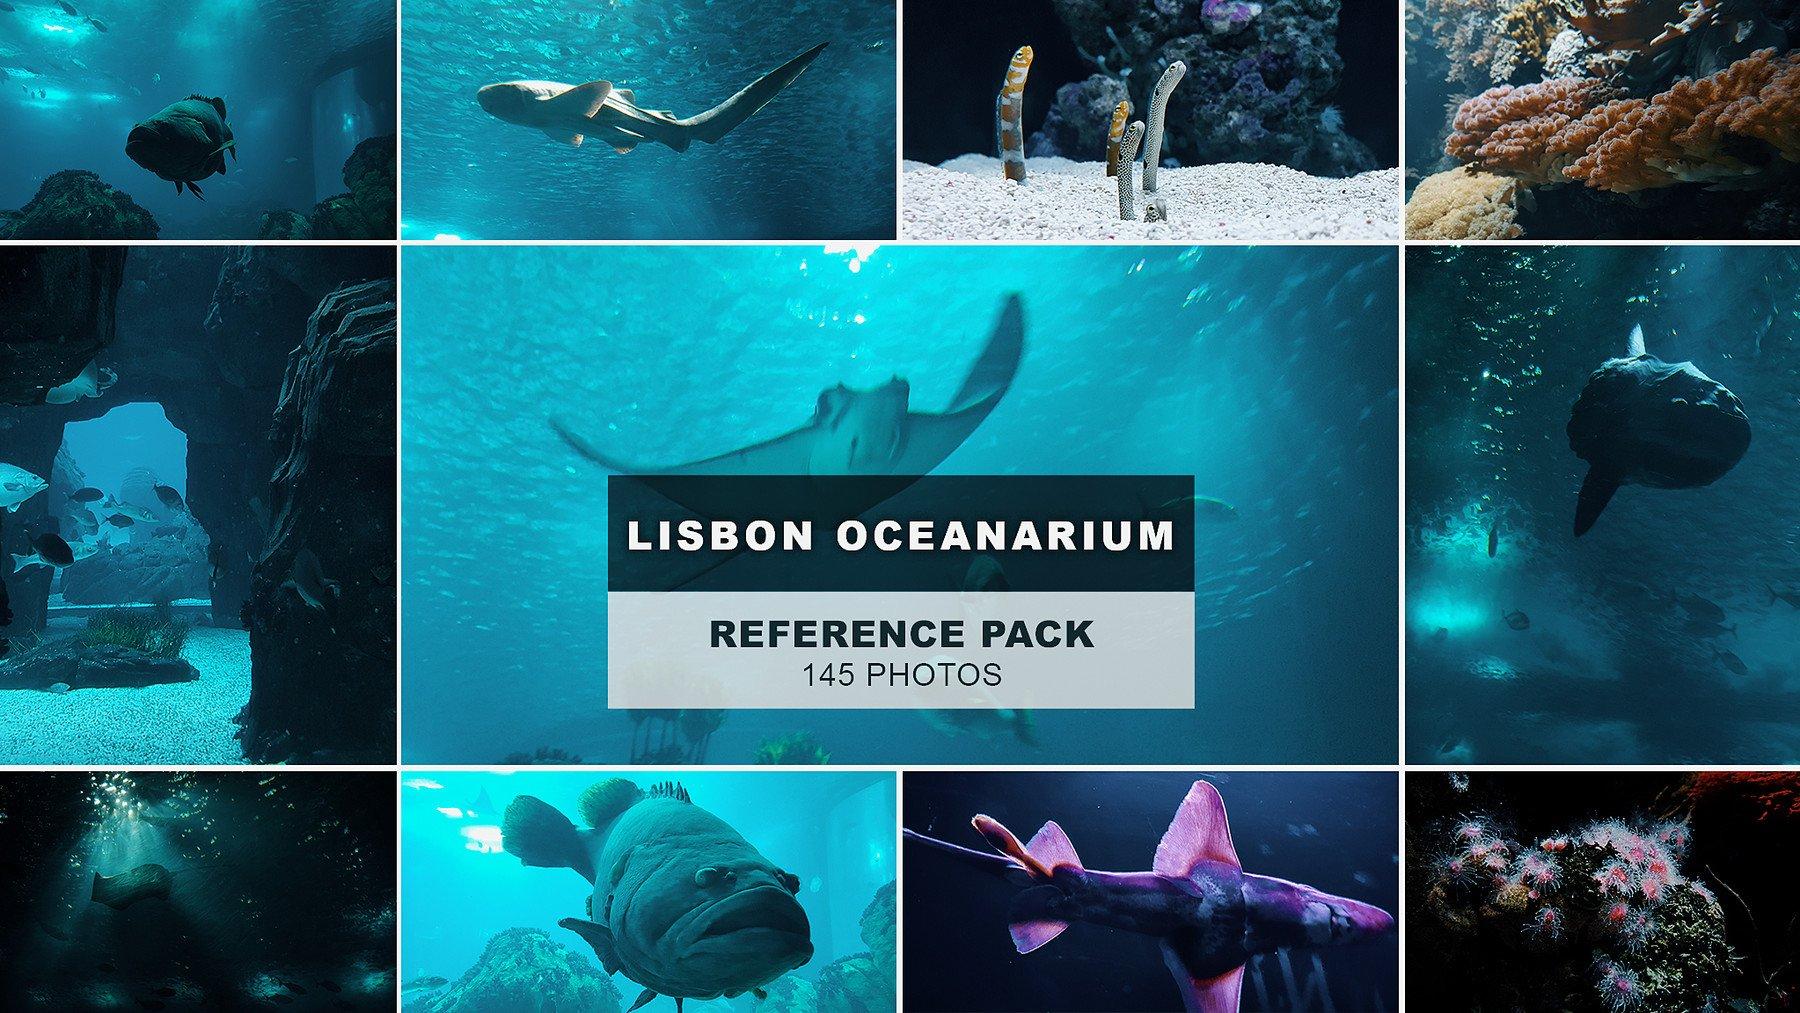 overview of the Lisbon Oceanarium pack